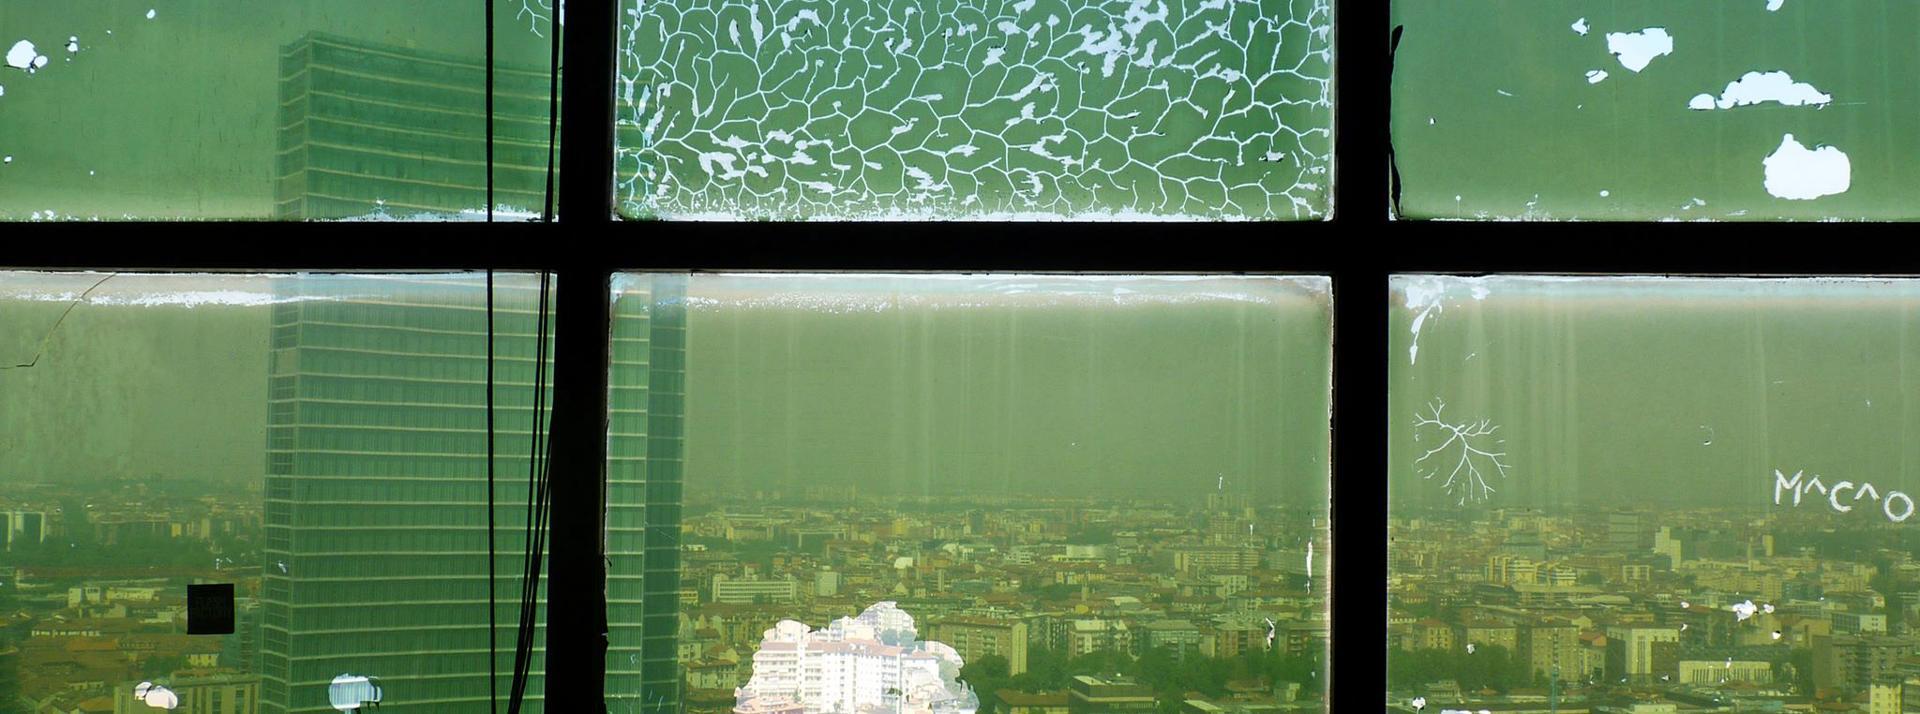 Torre Galfa, Milano